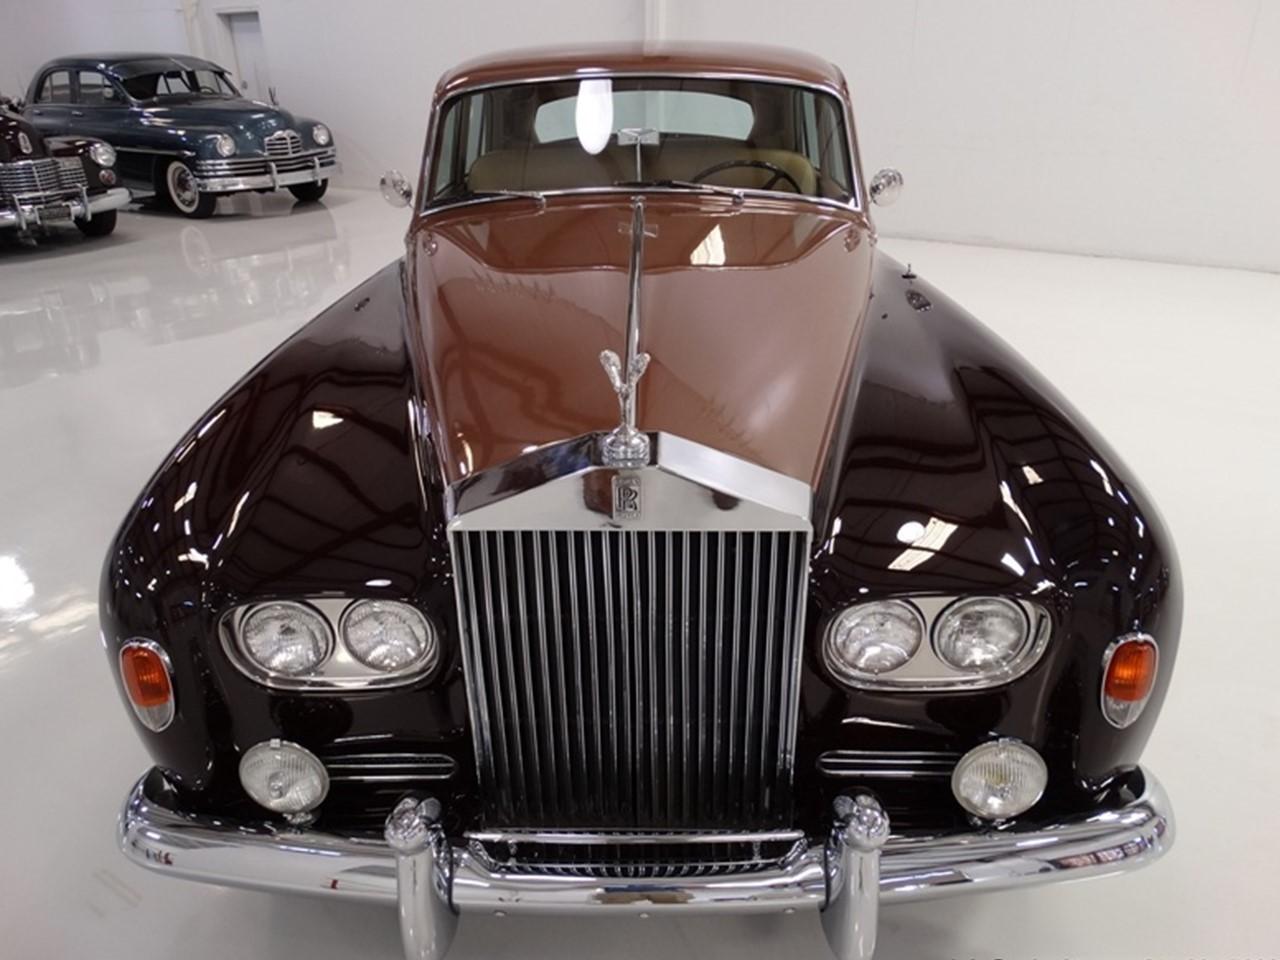 1965 Silver Cloud III 2